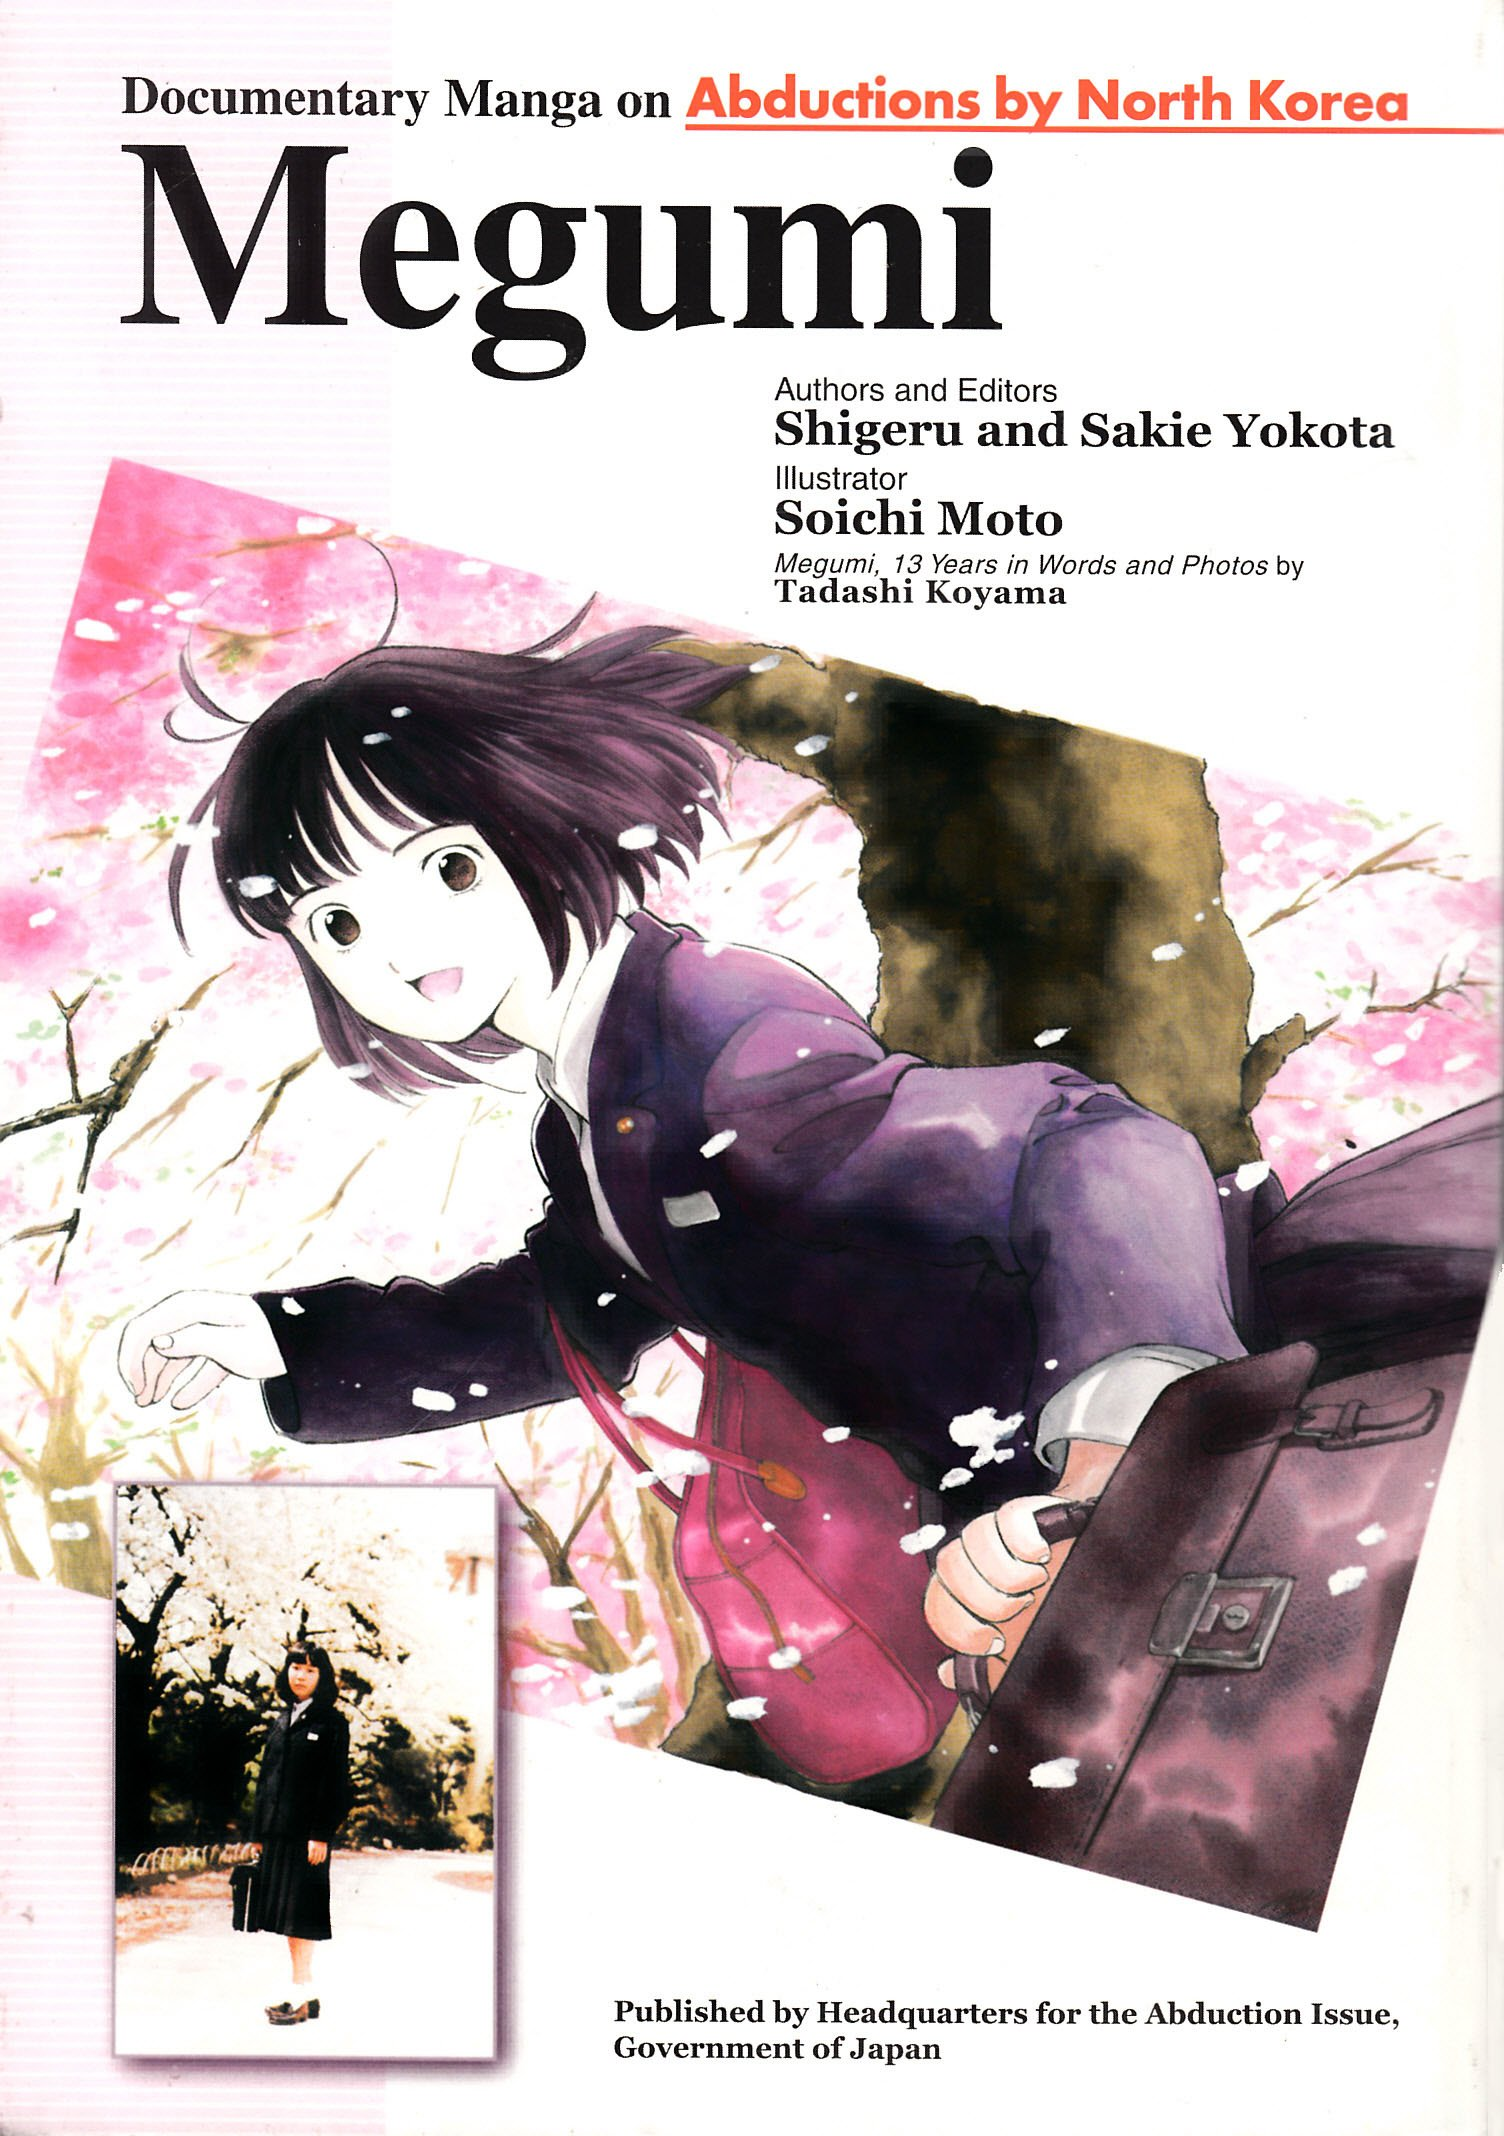 Megumi Documentary Manga On Abductions By North Amazoncouk 9784575300260 Books